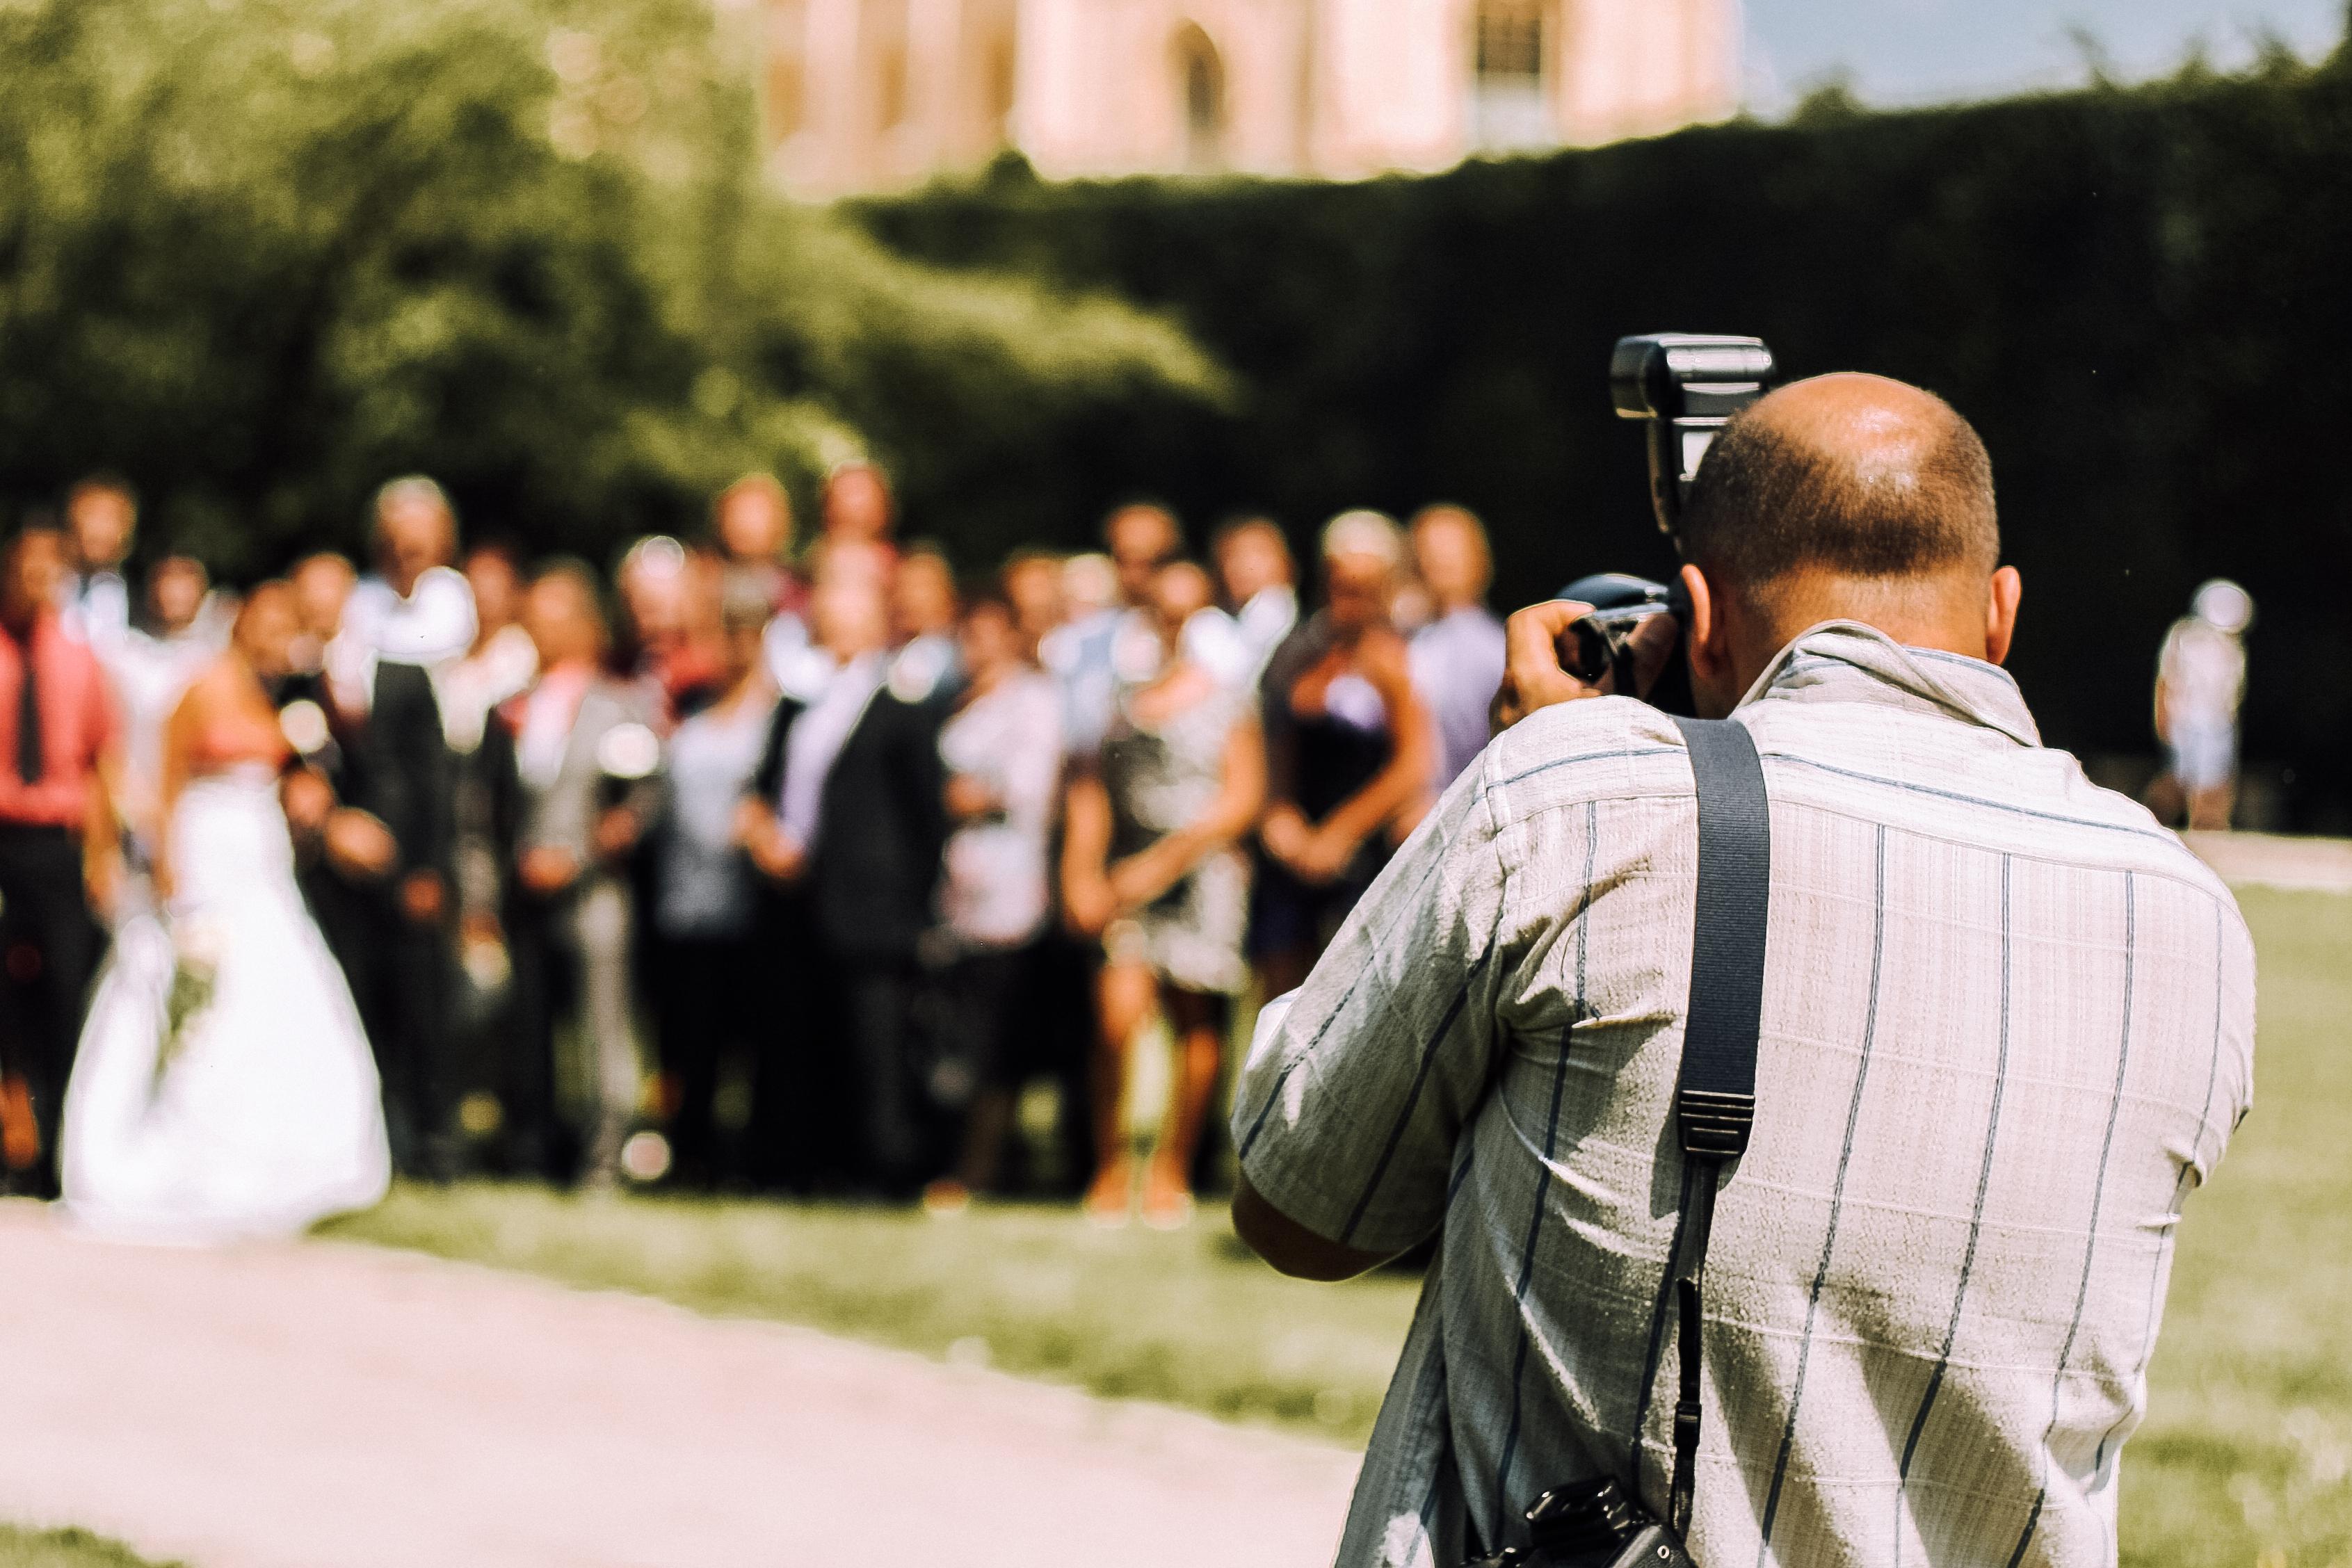 wedding-photographer-picjumbo-com.jpg